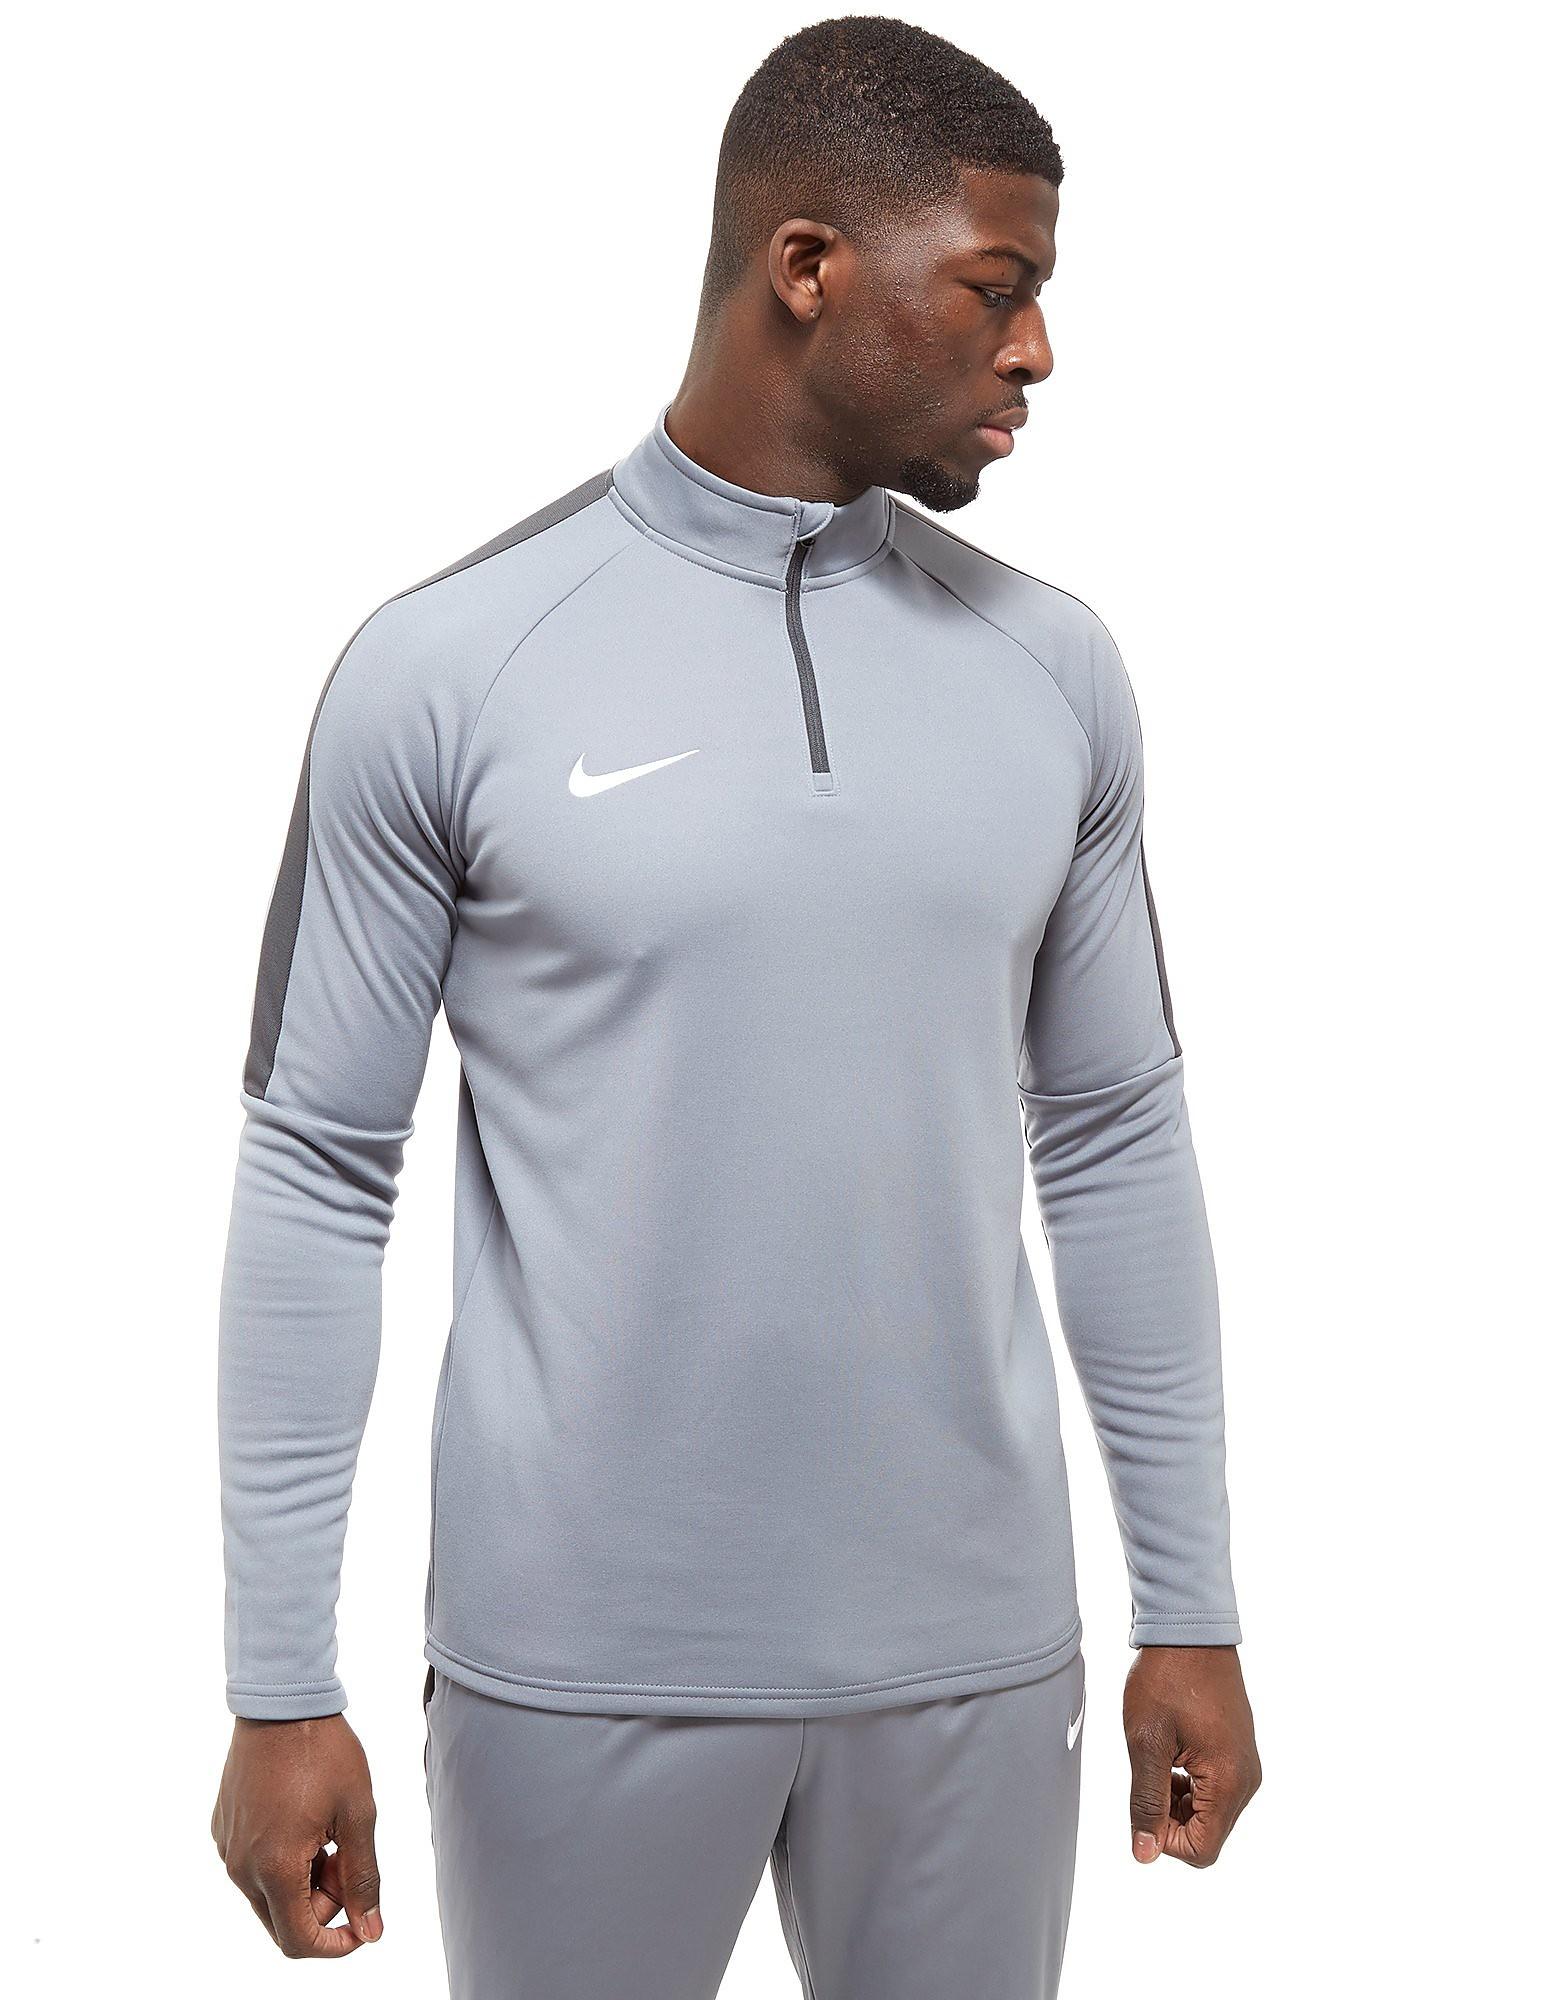 Nike Men's Academy Drill Top